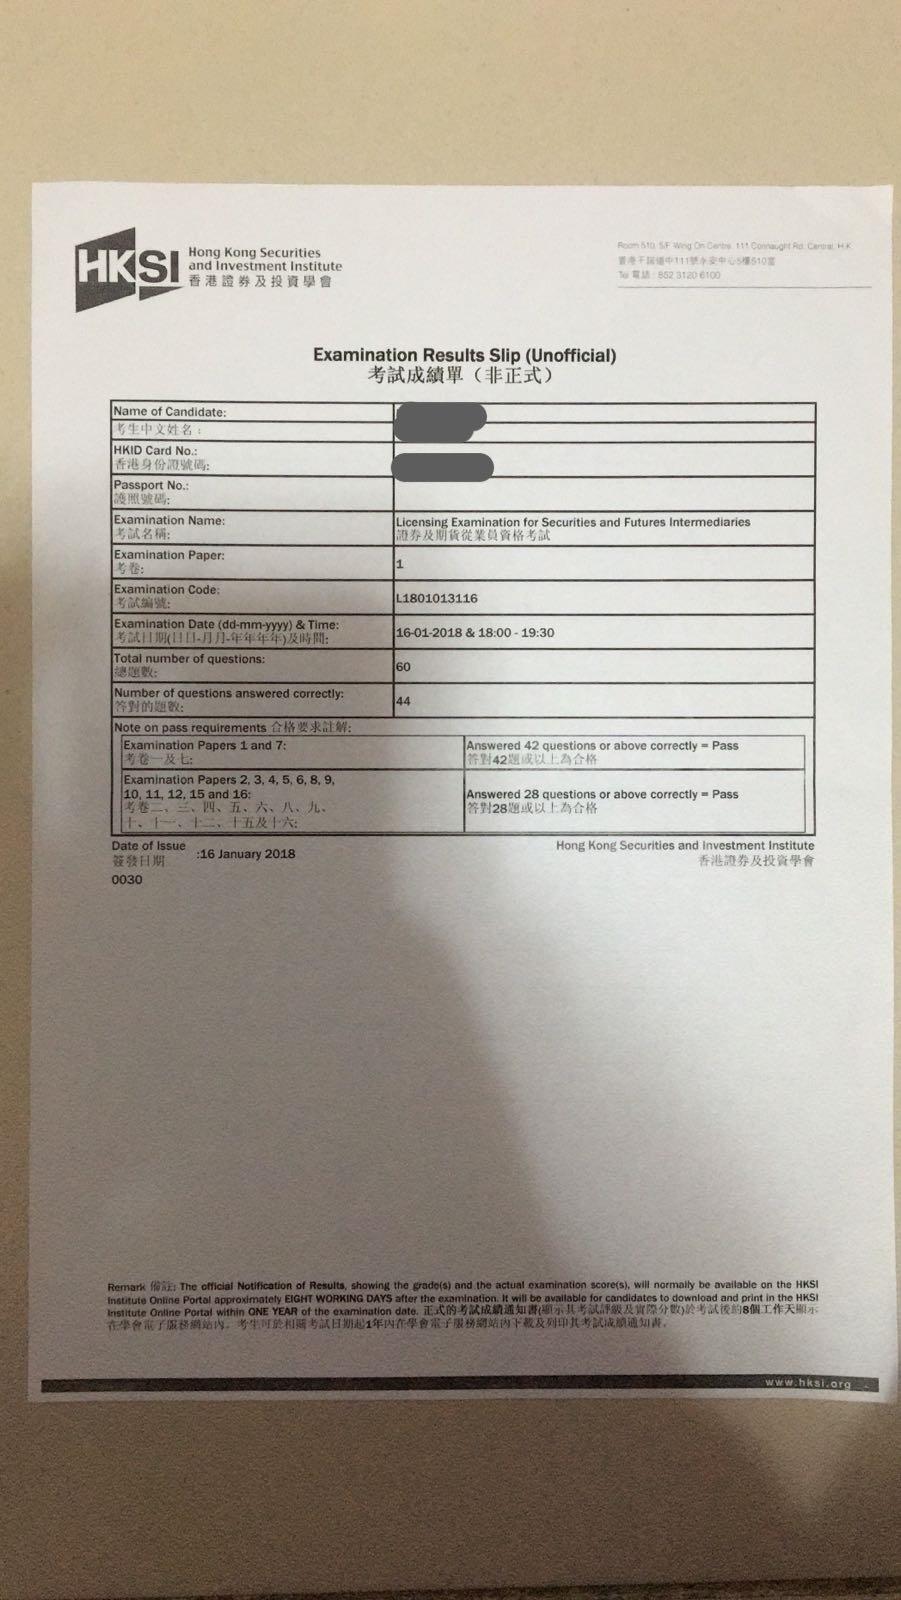 LML 16/1/2018 LE Paper 1 證券期貨從業員資格考試卷一 Pass